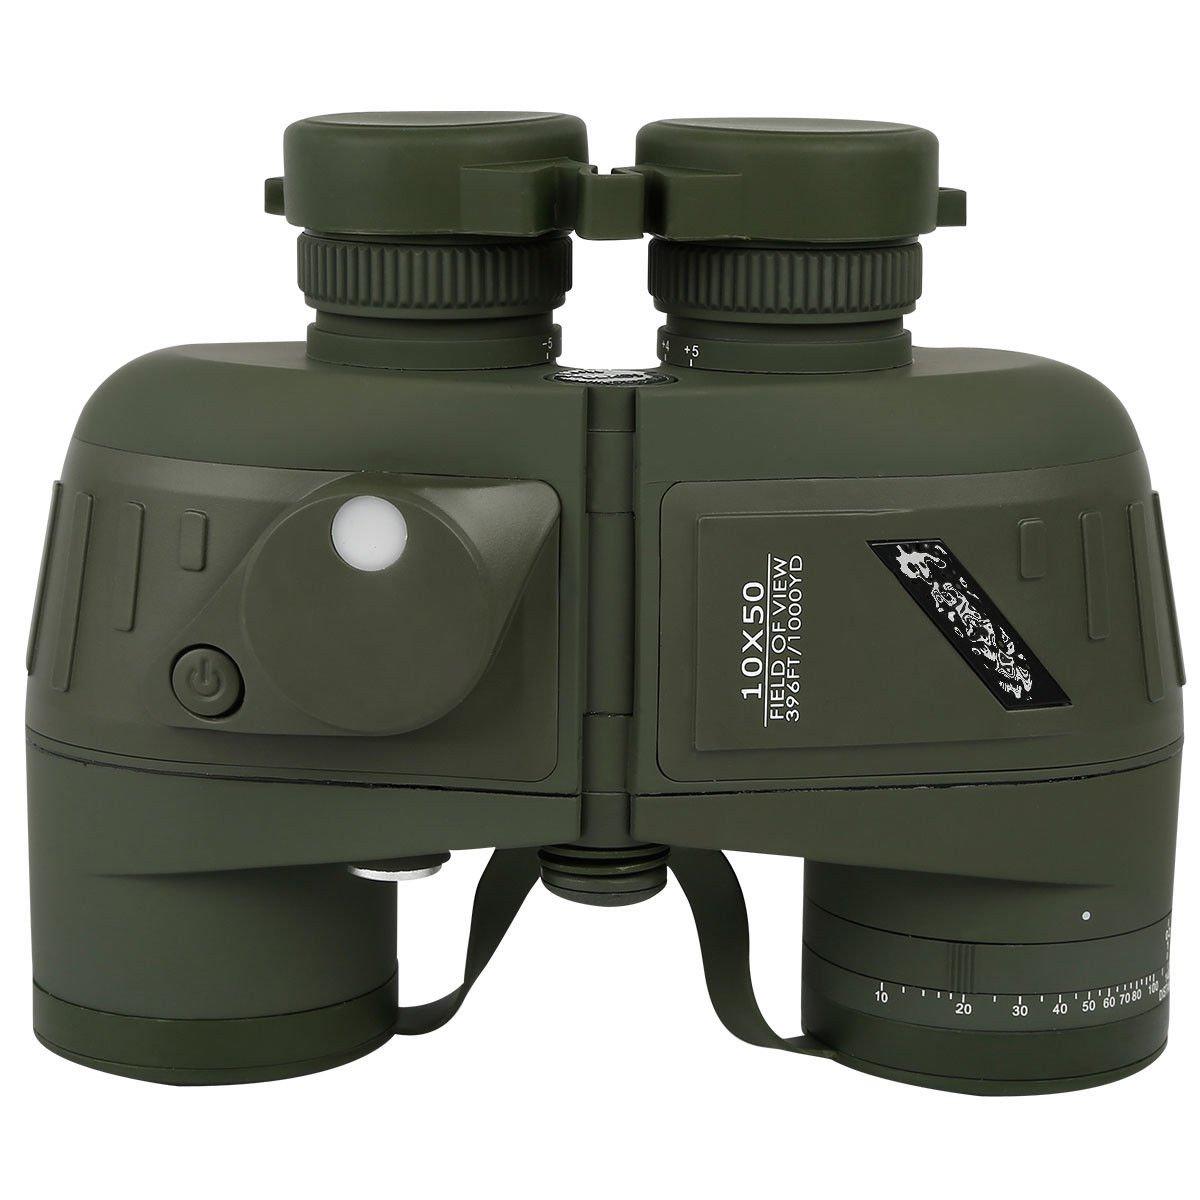 Tengchang 10X50 Night Vision Binoculars w/Rangefinder&Compass Marine by Tengchang